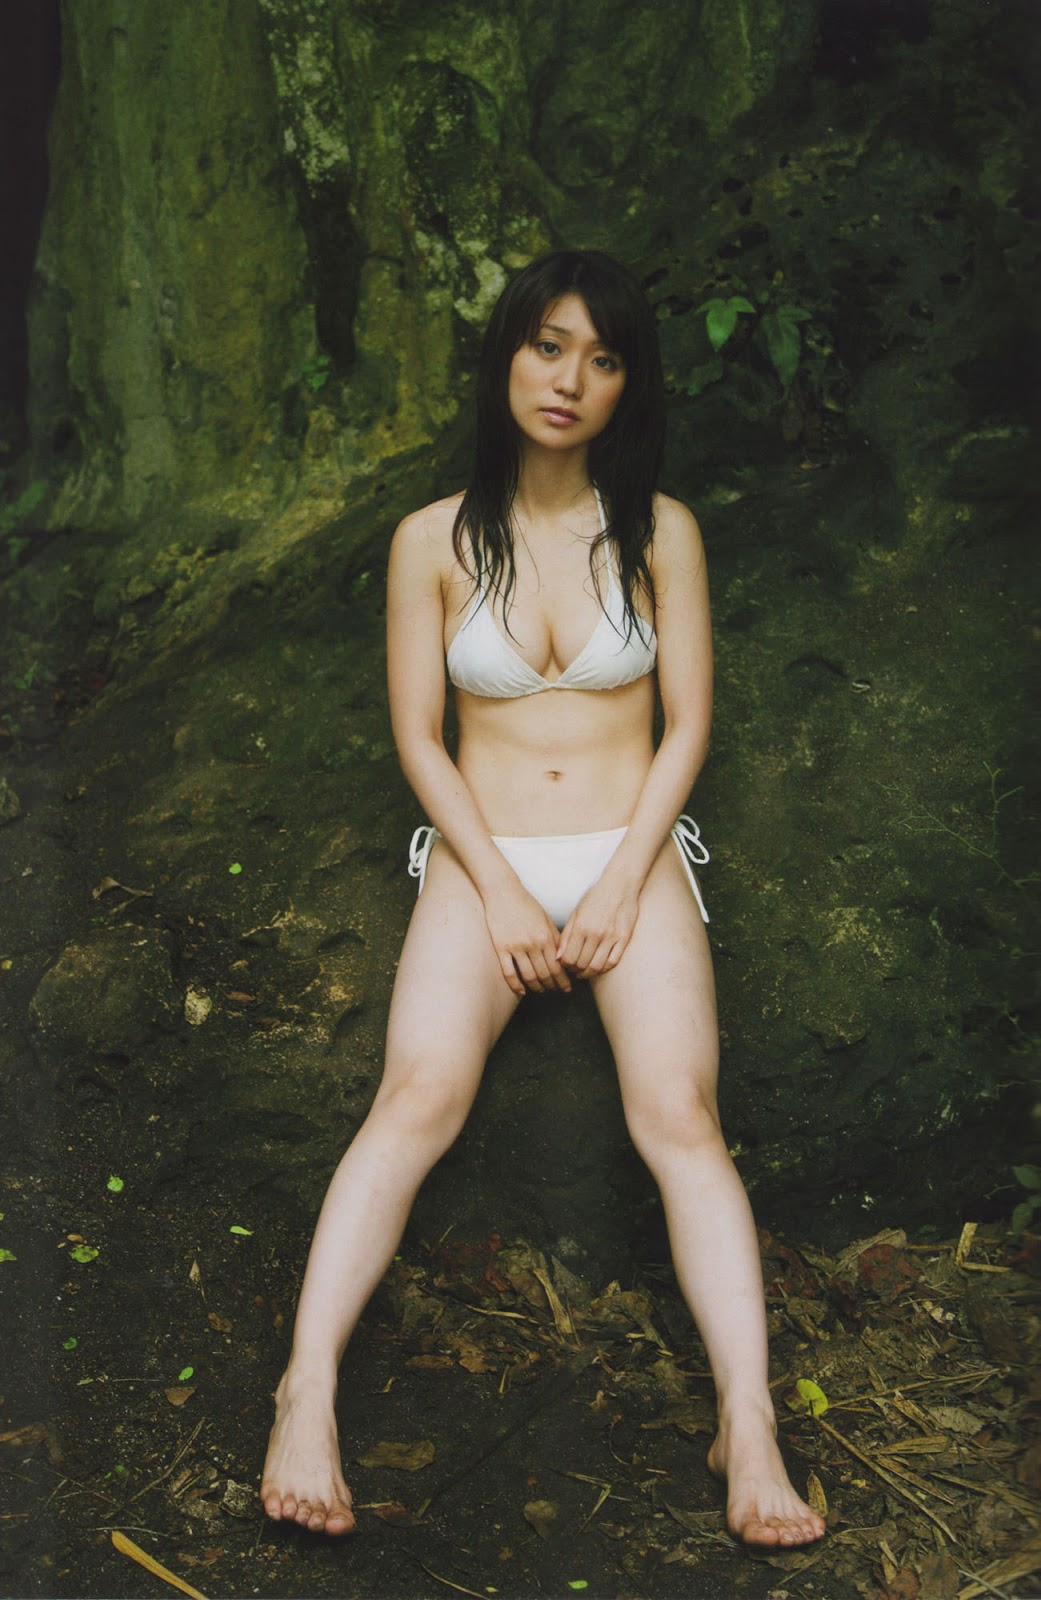 kyoko fukada nude fake Nao Kanzaki and a few friends: Nao Kanzaki's top ten for 2015.... #3- Yuko  Oshima